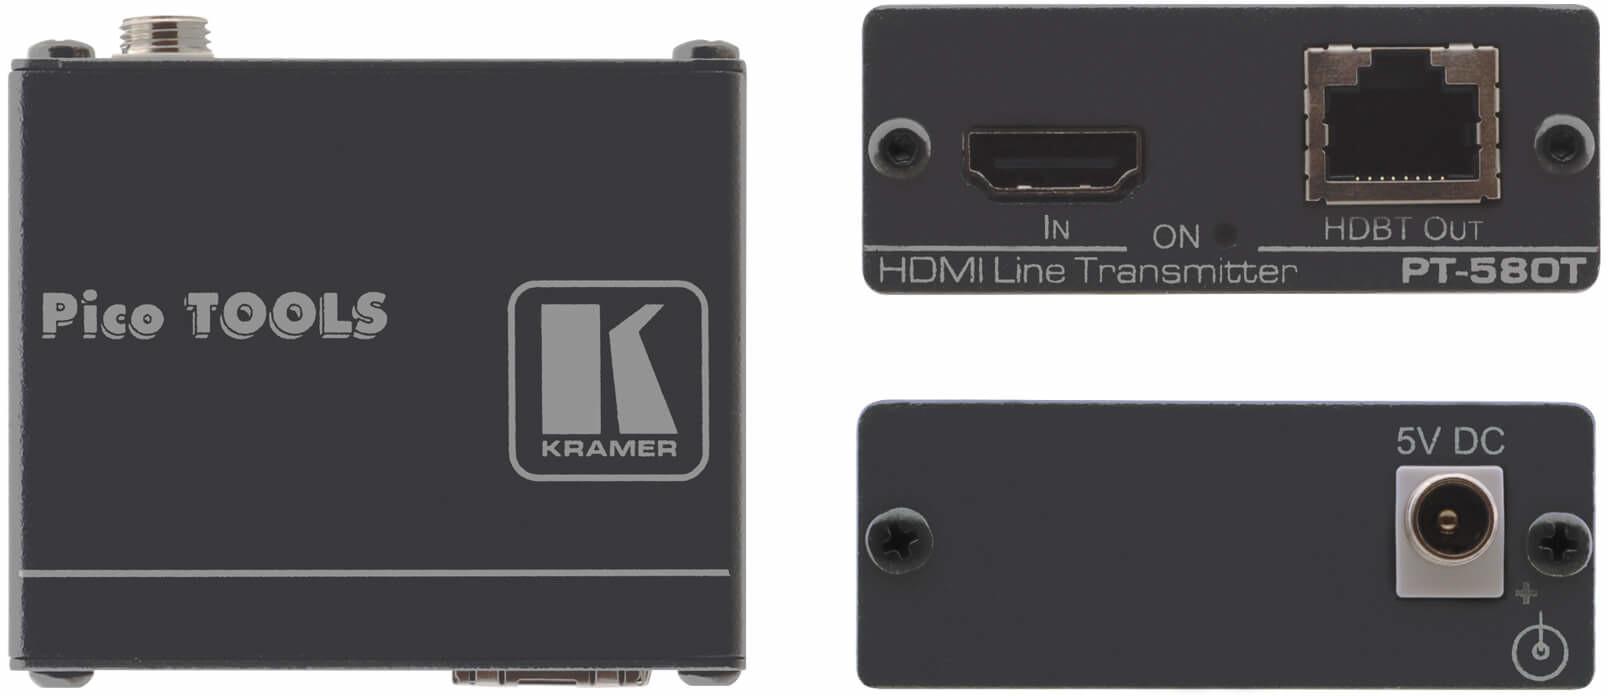 Kramer Electronics 4K60 4:2:0 HDMI HDCP 2.2 Compact Transmitter over Long-Reach HDBaseT